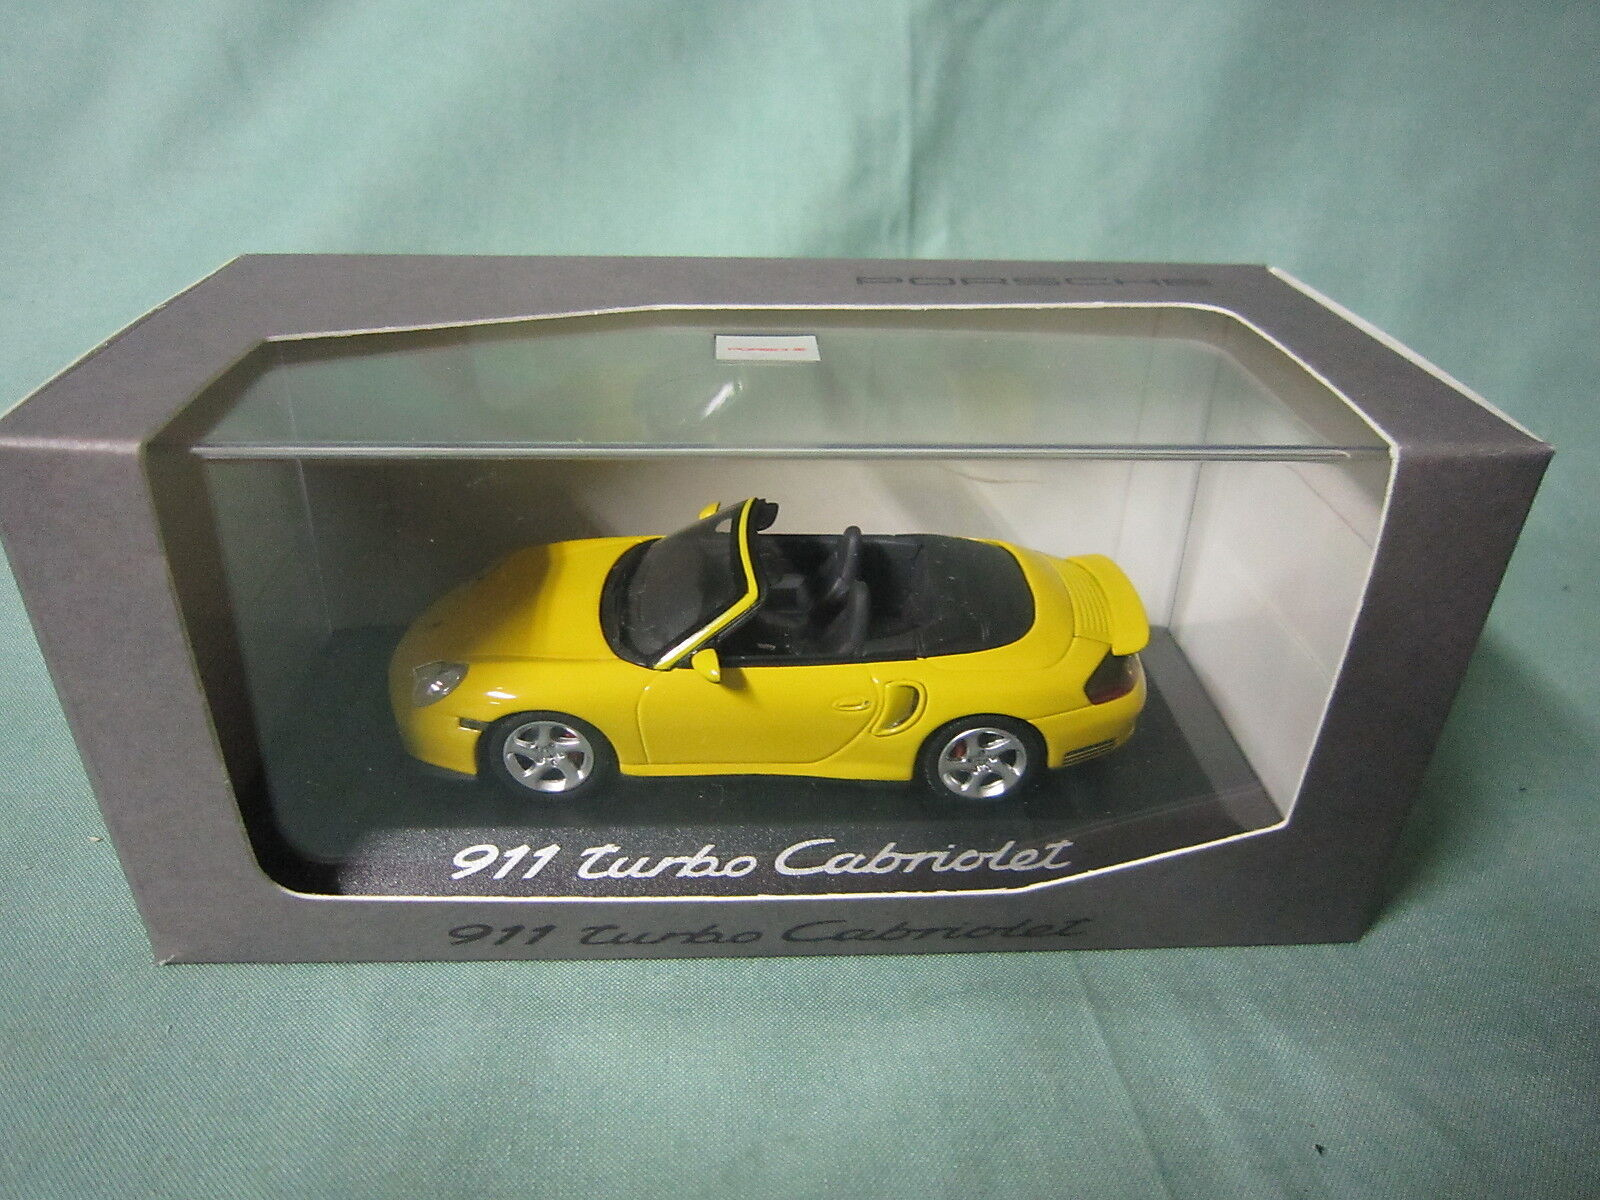 Dv4962 minichamps porsche 911 turbo cabriolet ref wap - 020 102 14 1 43 nb